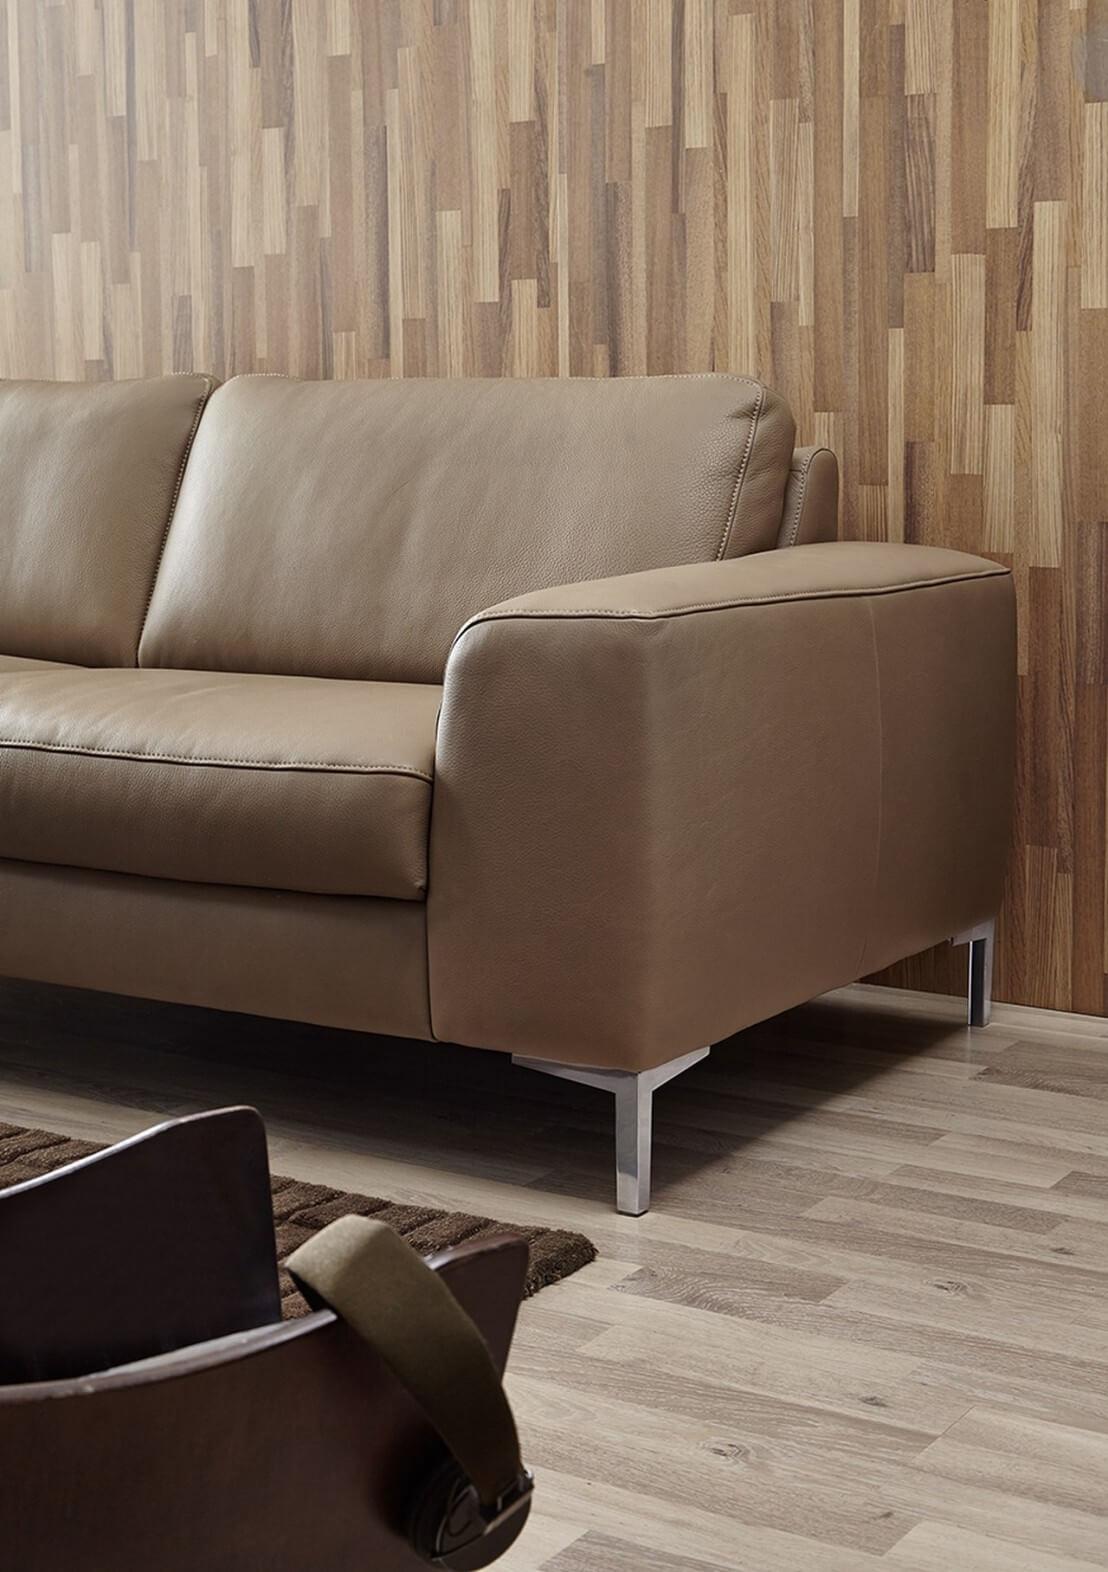 canap 3 places idyl design en cuir. Black Bedroom Furniture Sets. Home Design Ideas